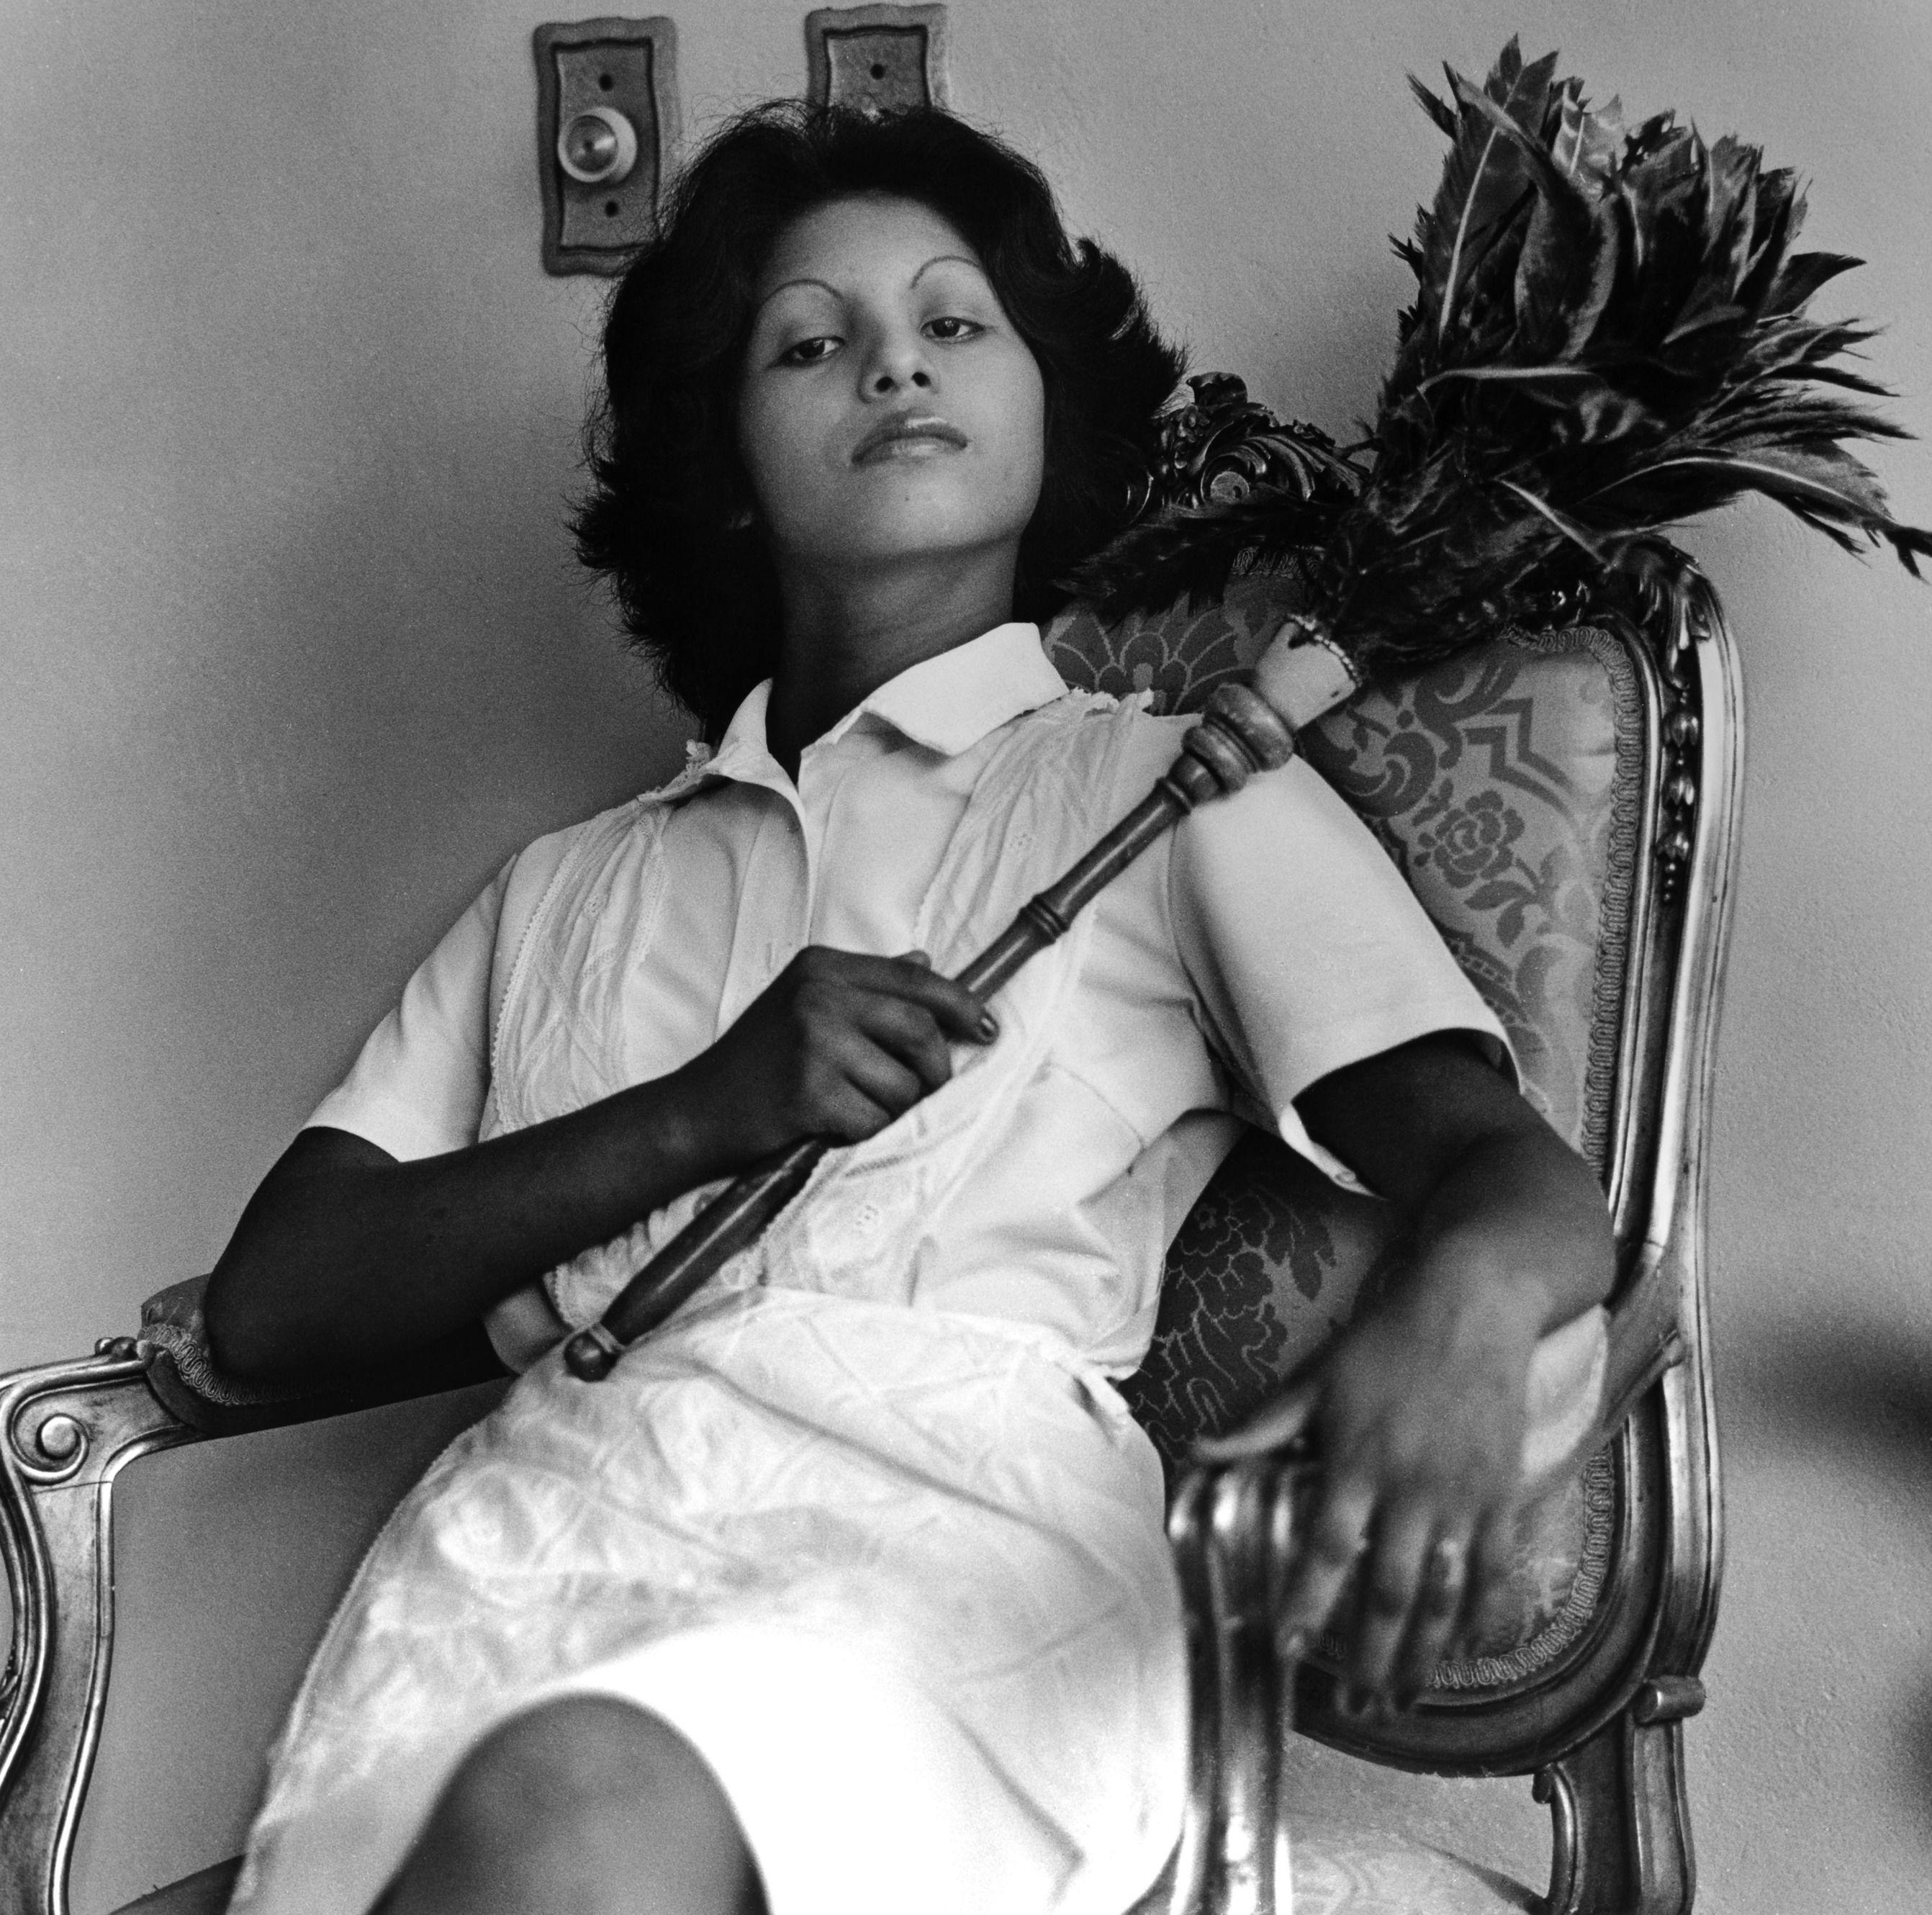 Communication on this topic: Ellaline Terriss, anne-stallybrass-born-1938/